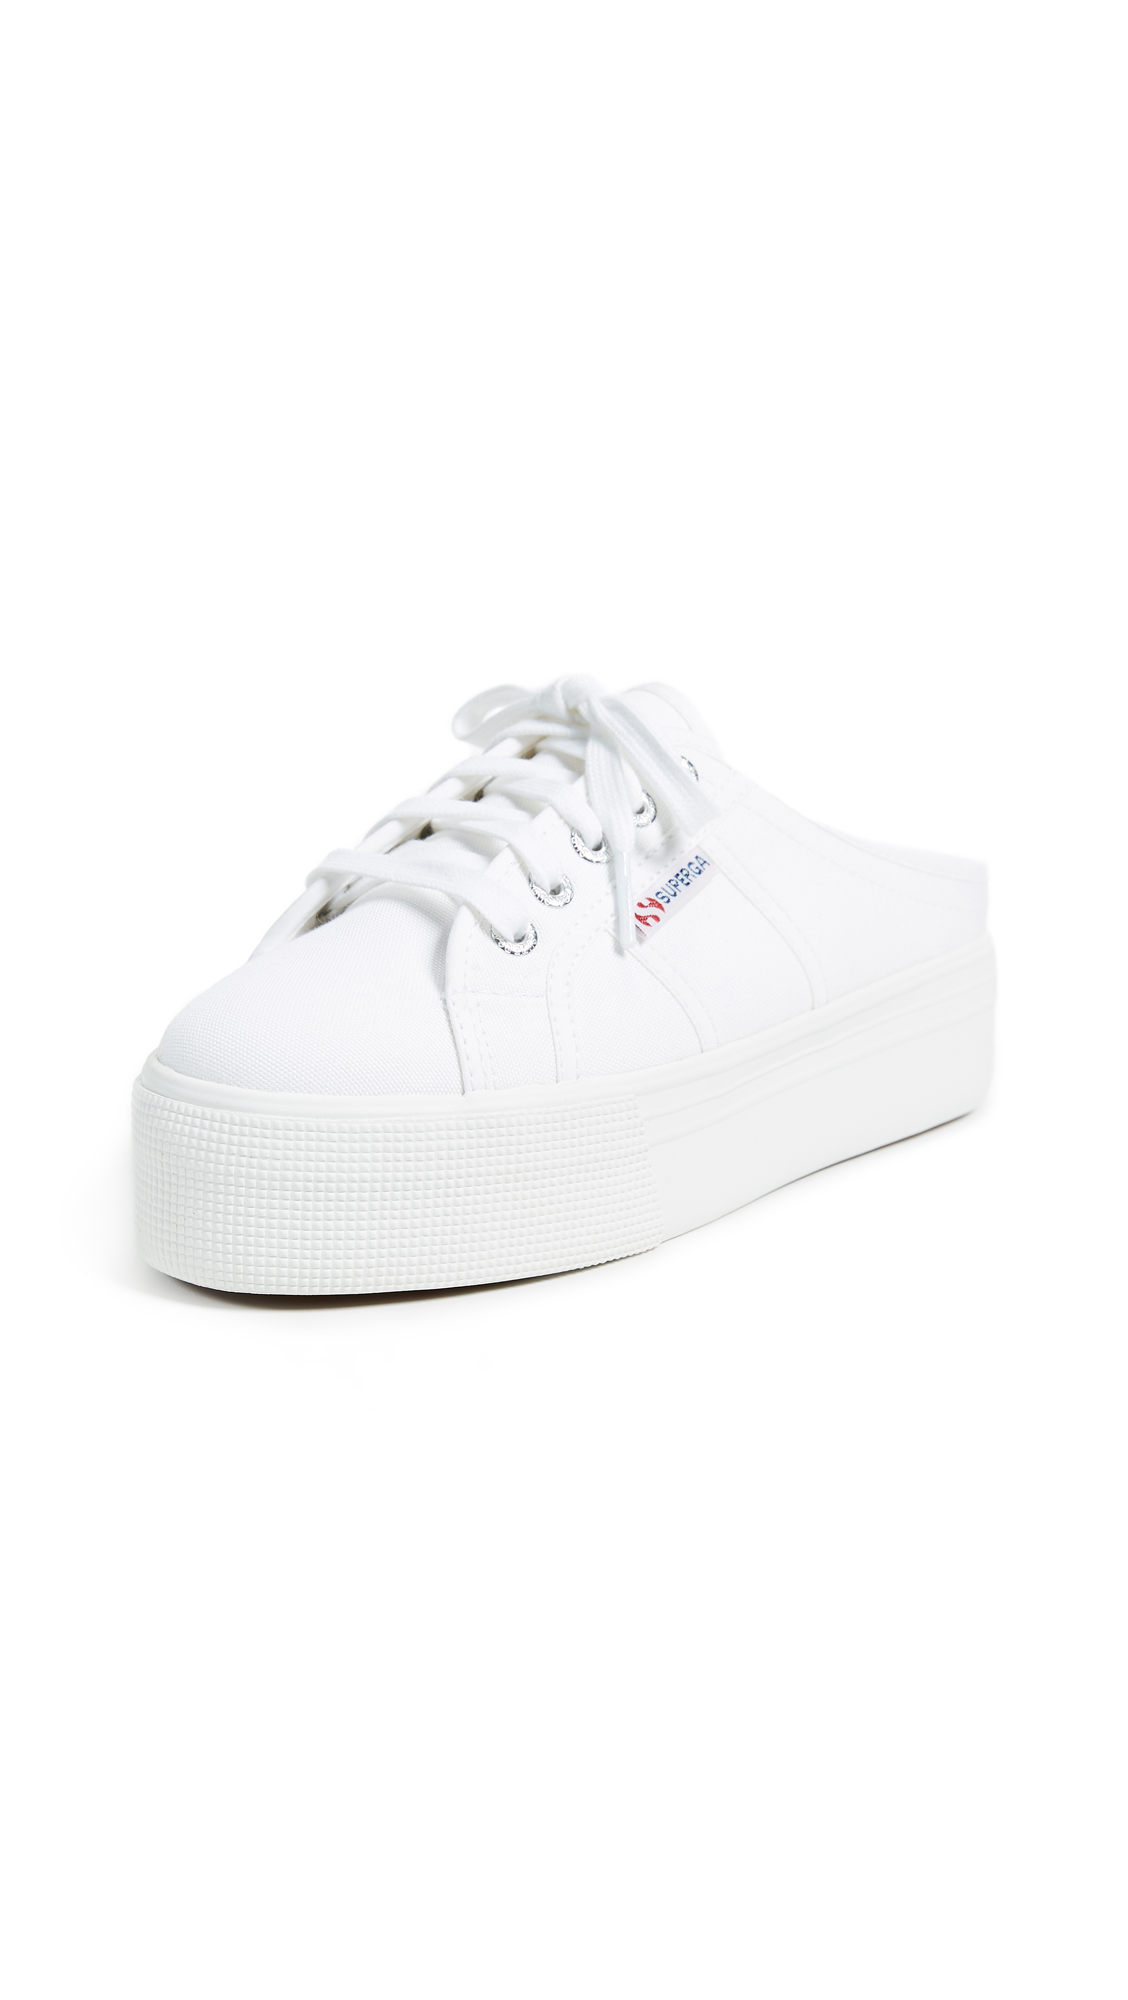 Superga 2284 C0TW Platform Sneakers - White